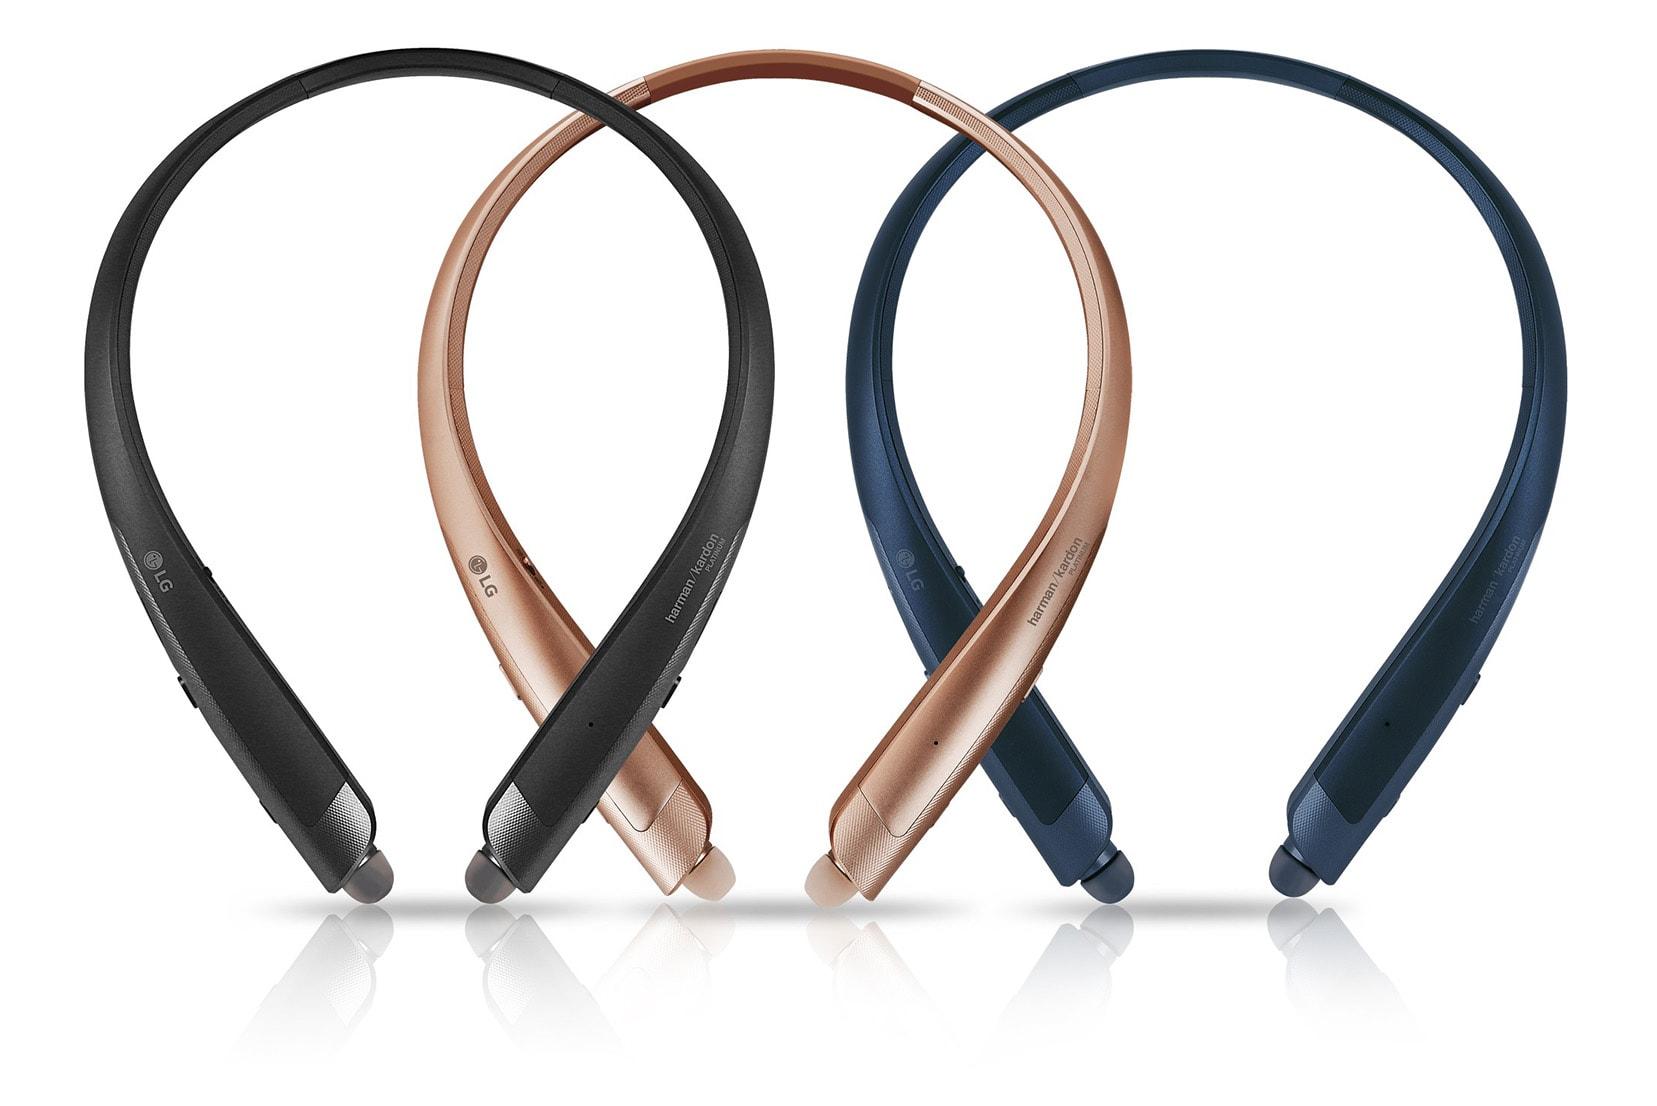 6c5ef9c0e79 LG's wireless Tone headphones have a Google Assistant button